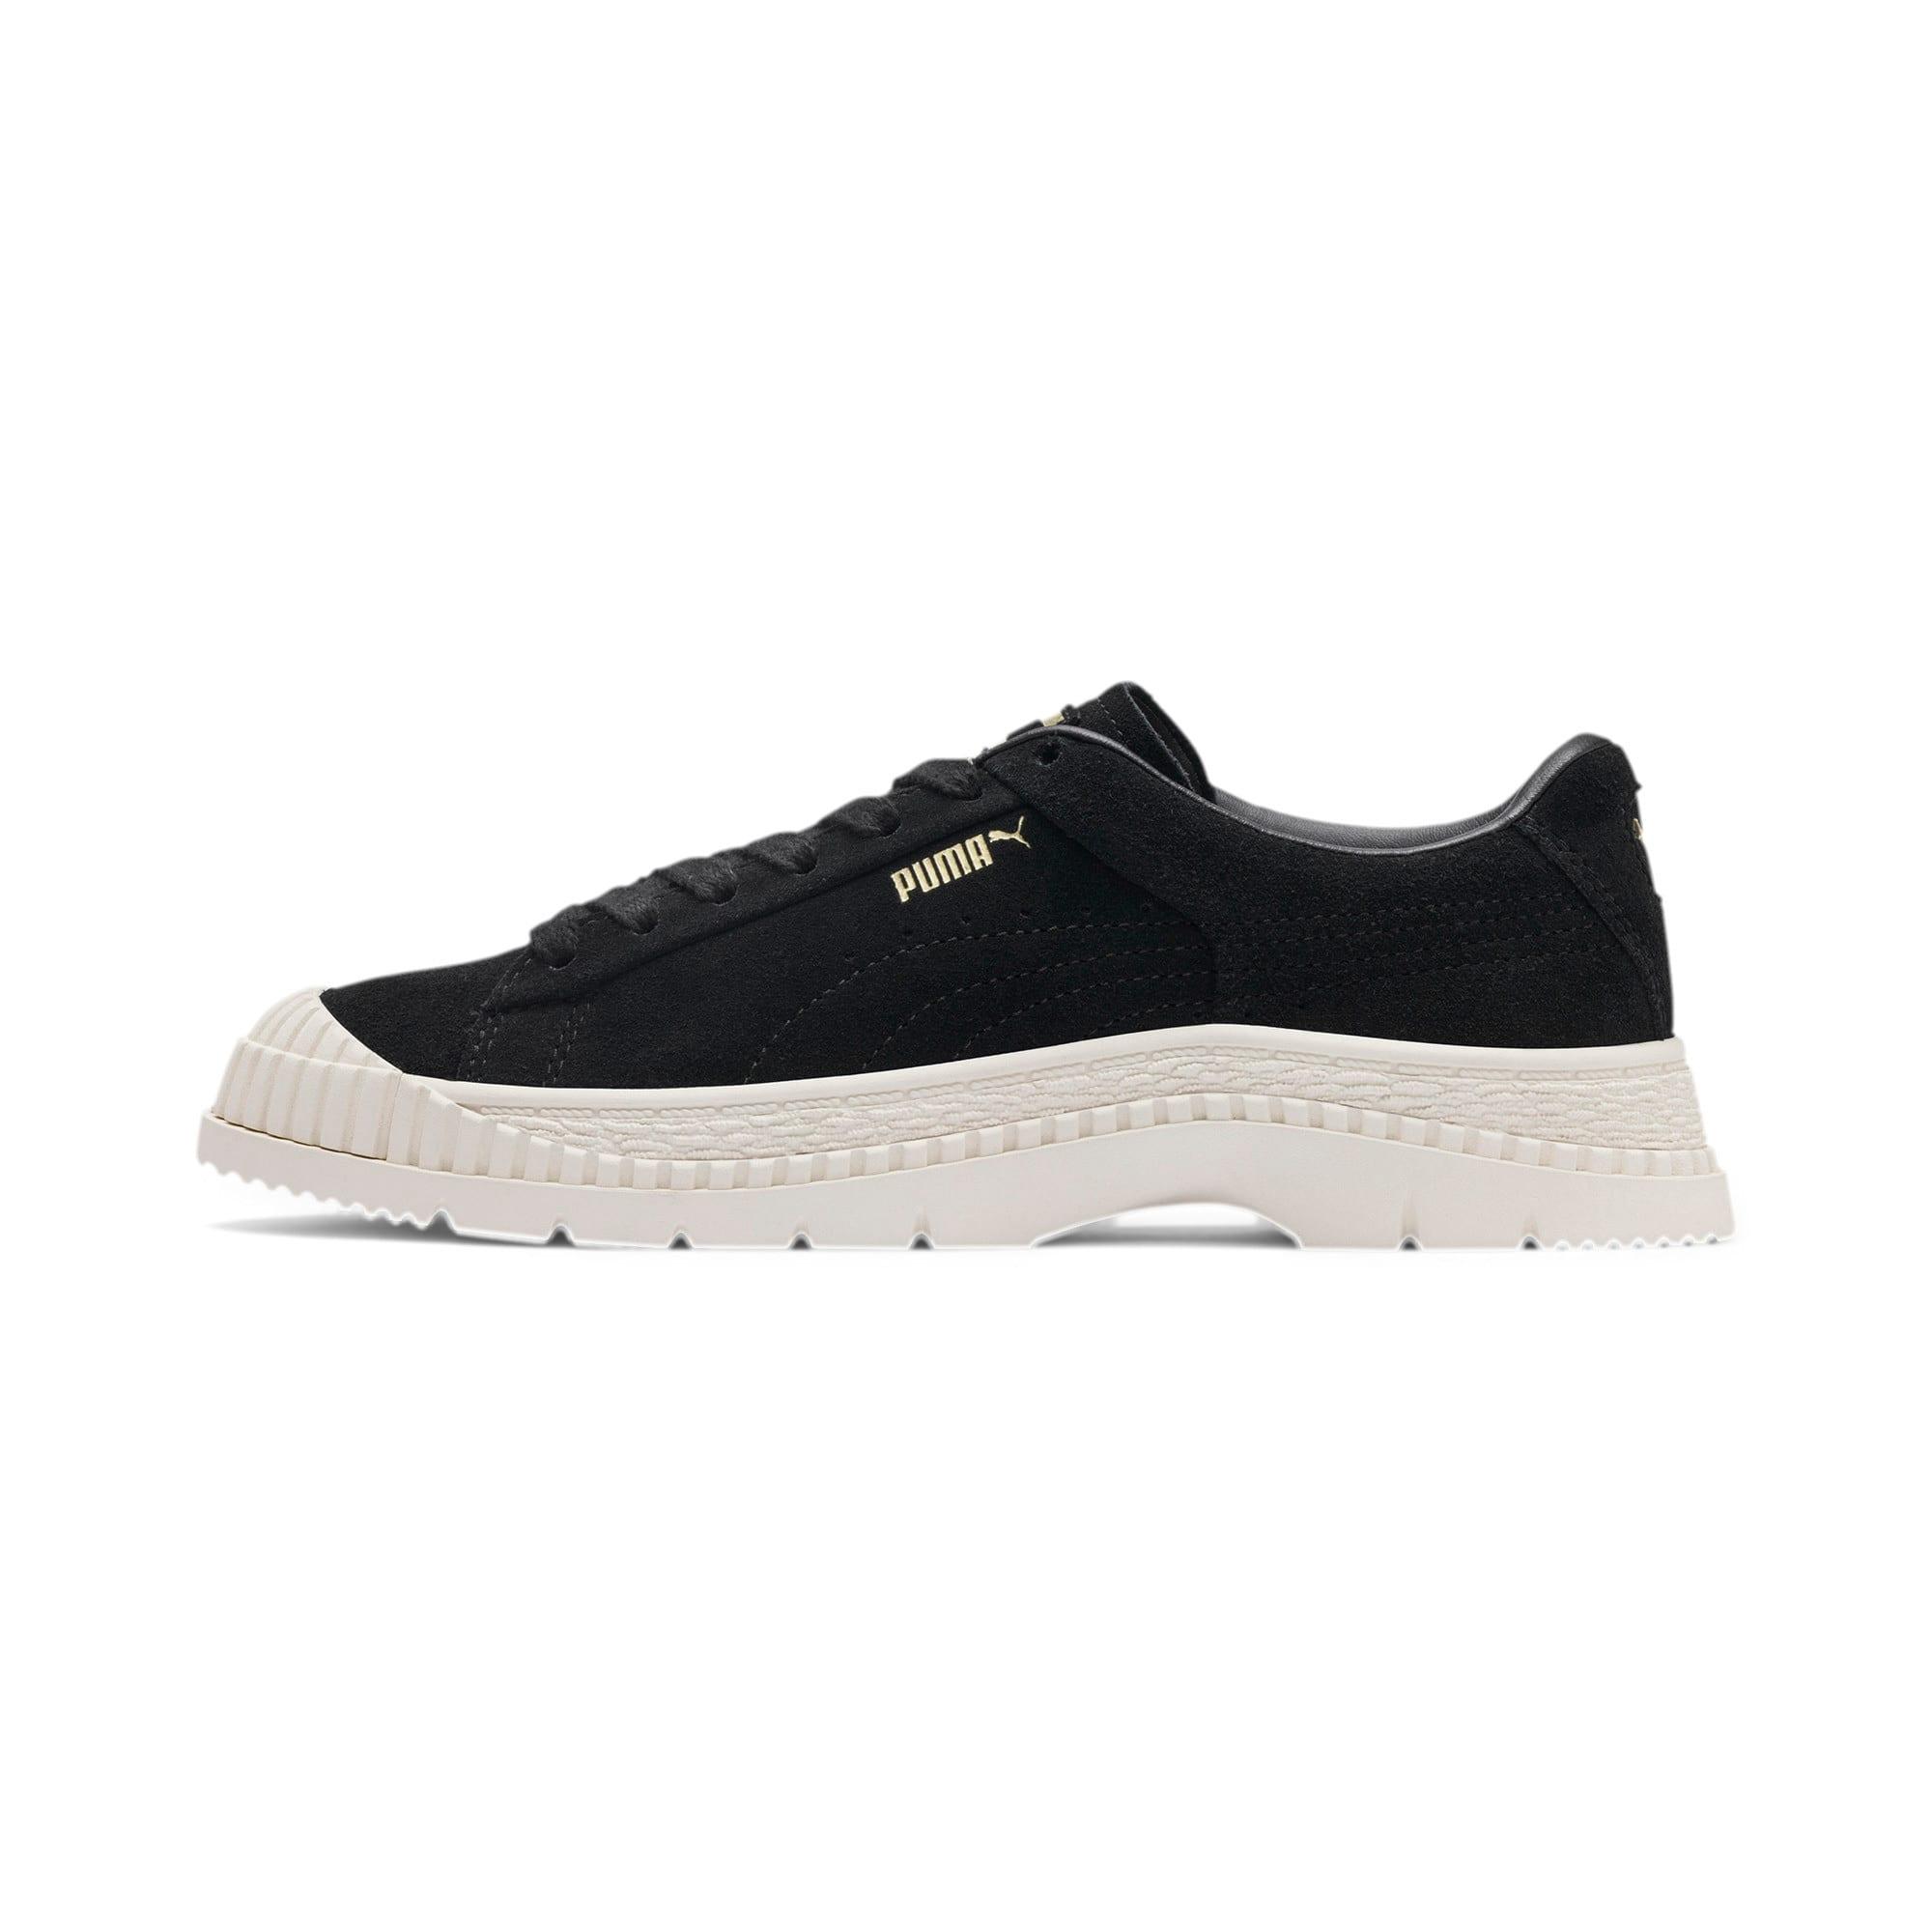 Thumbnail 1 of Utility Suede Women's Sneakers, Puma Black, medium